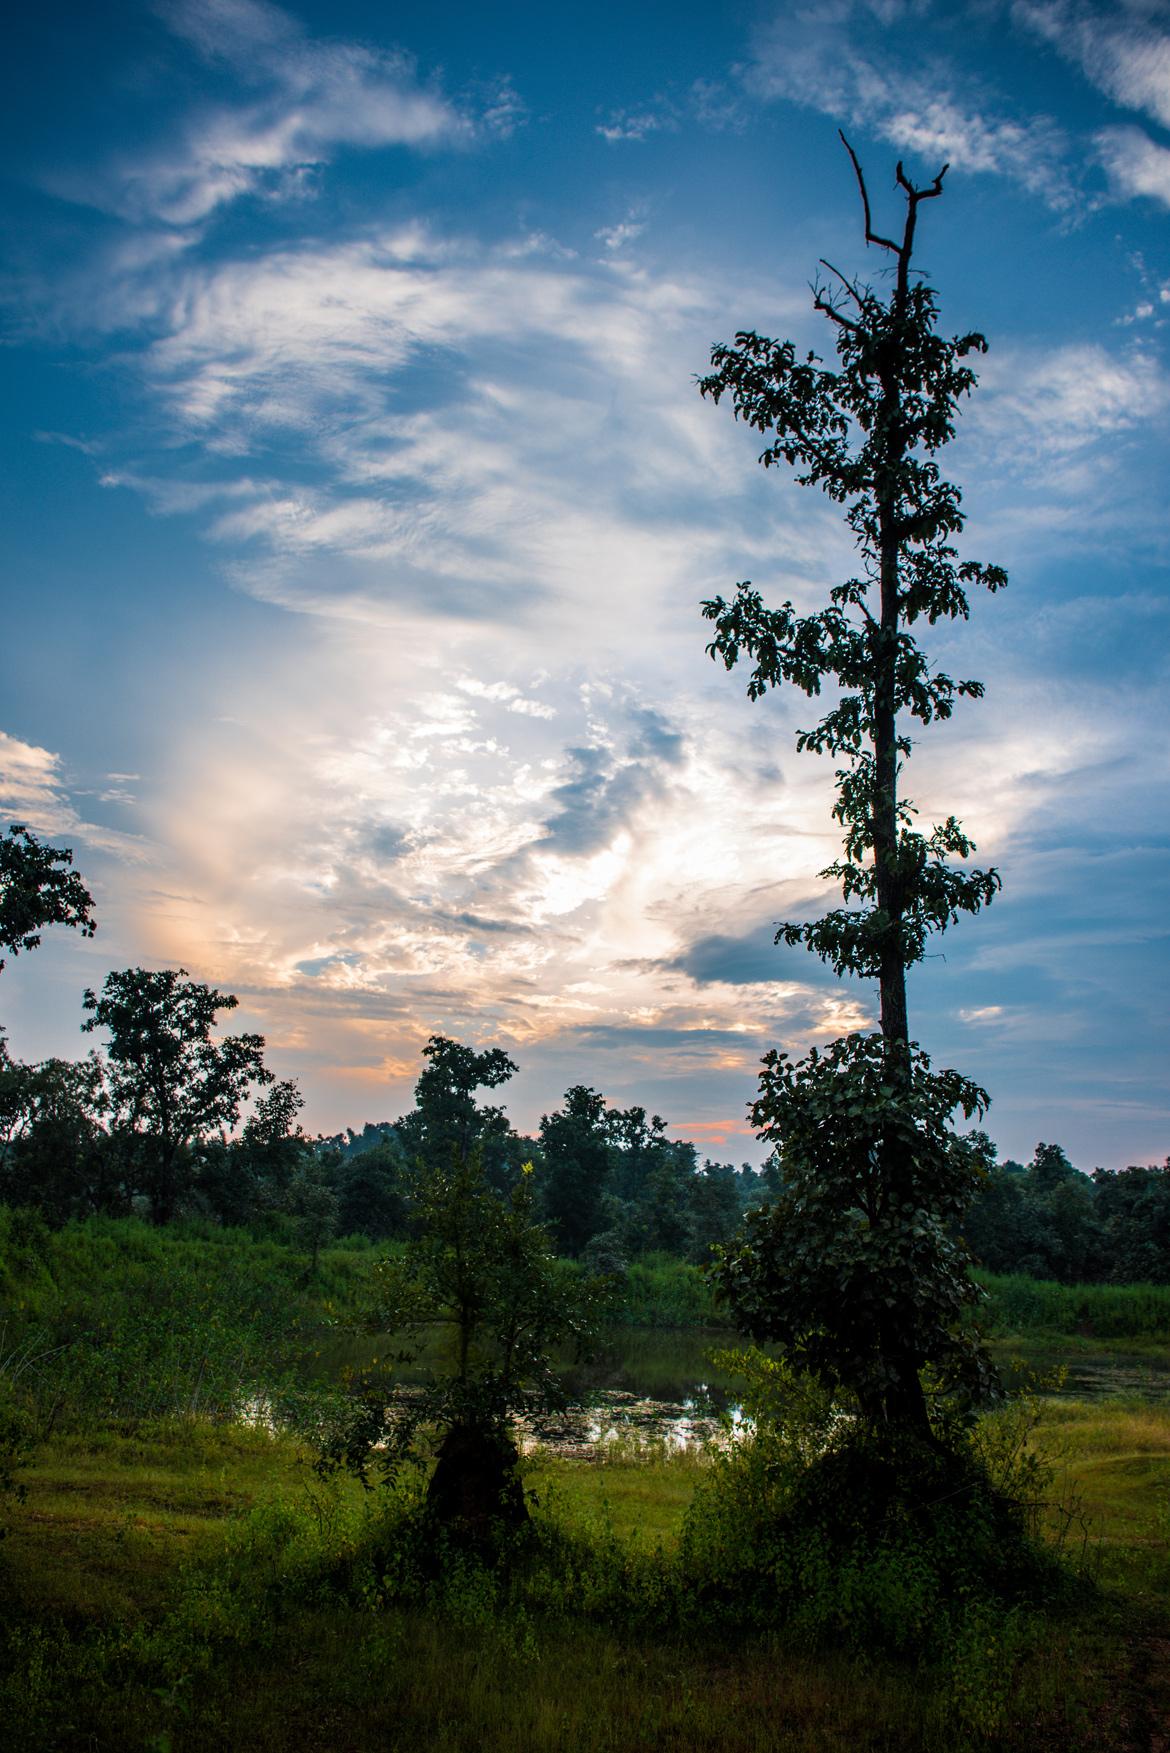 Dramatic sky after a short rain shower at Kanha National Park.